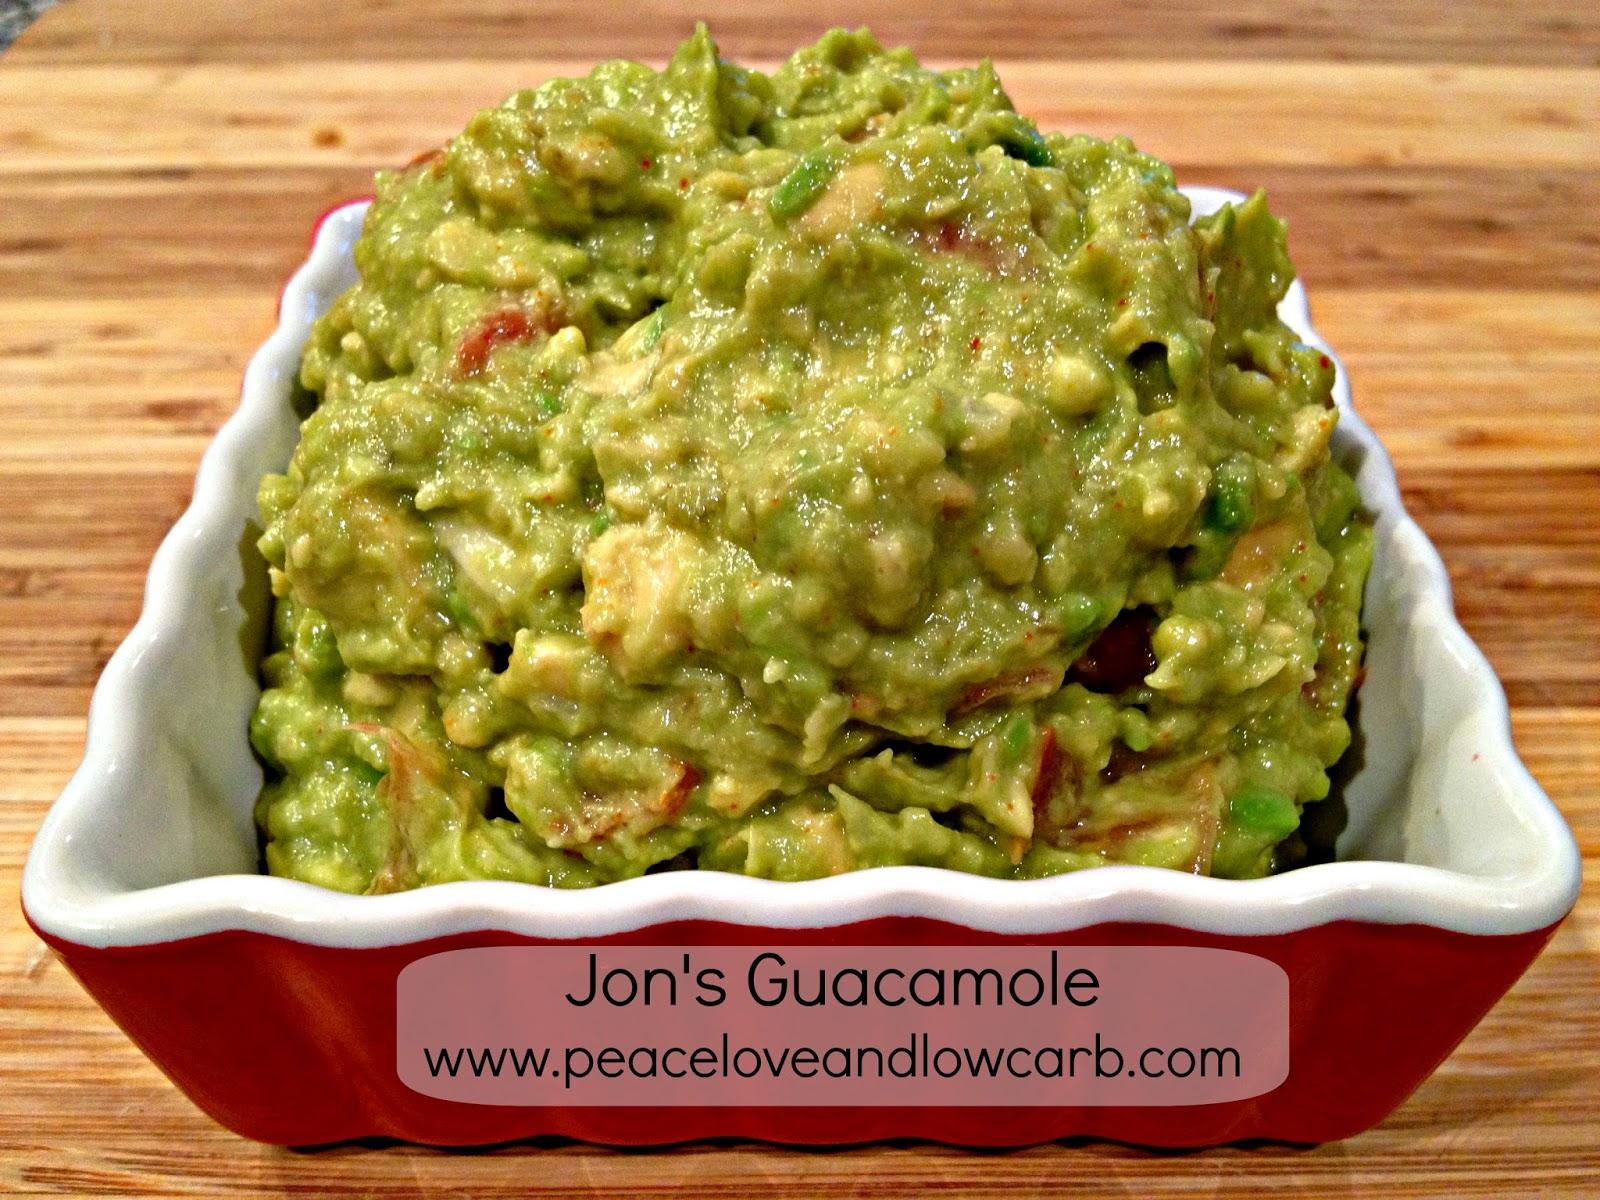 Jon's Guacamole - Low carb, Gluten Free, Paleo | Peace ...